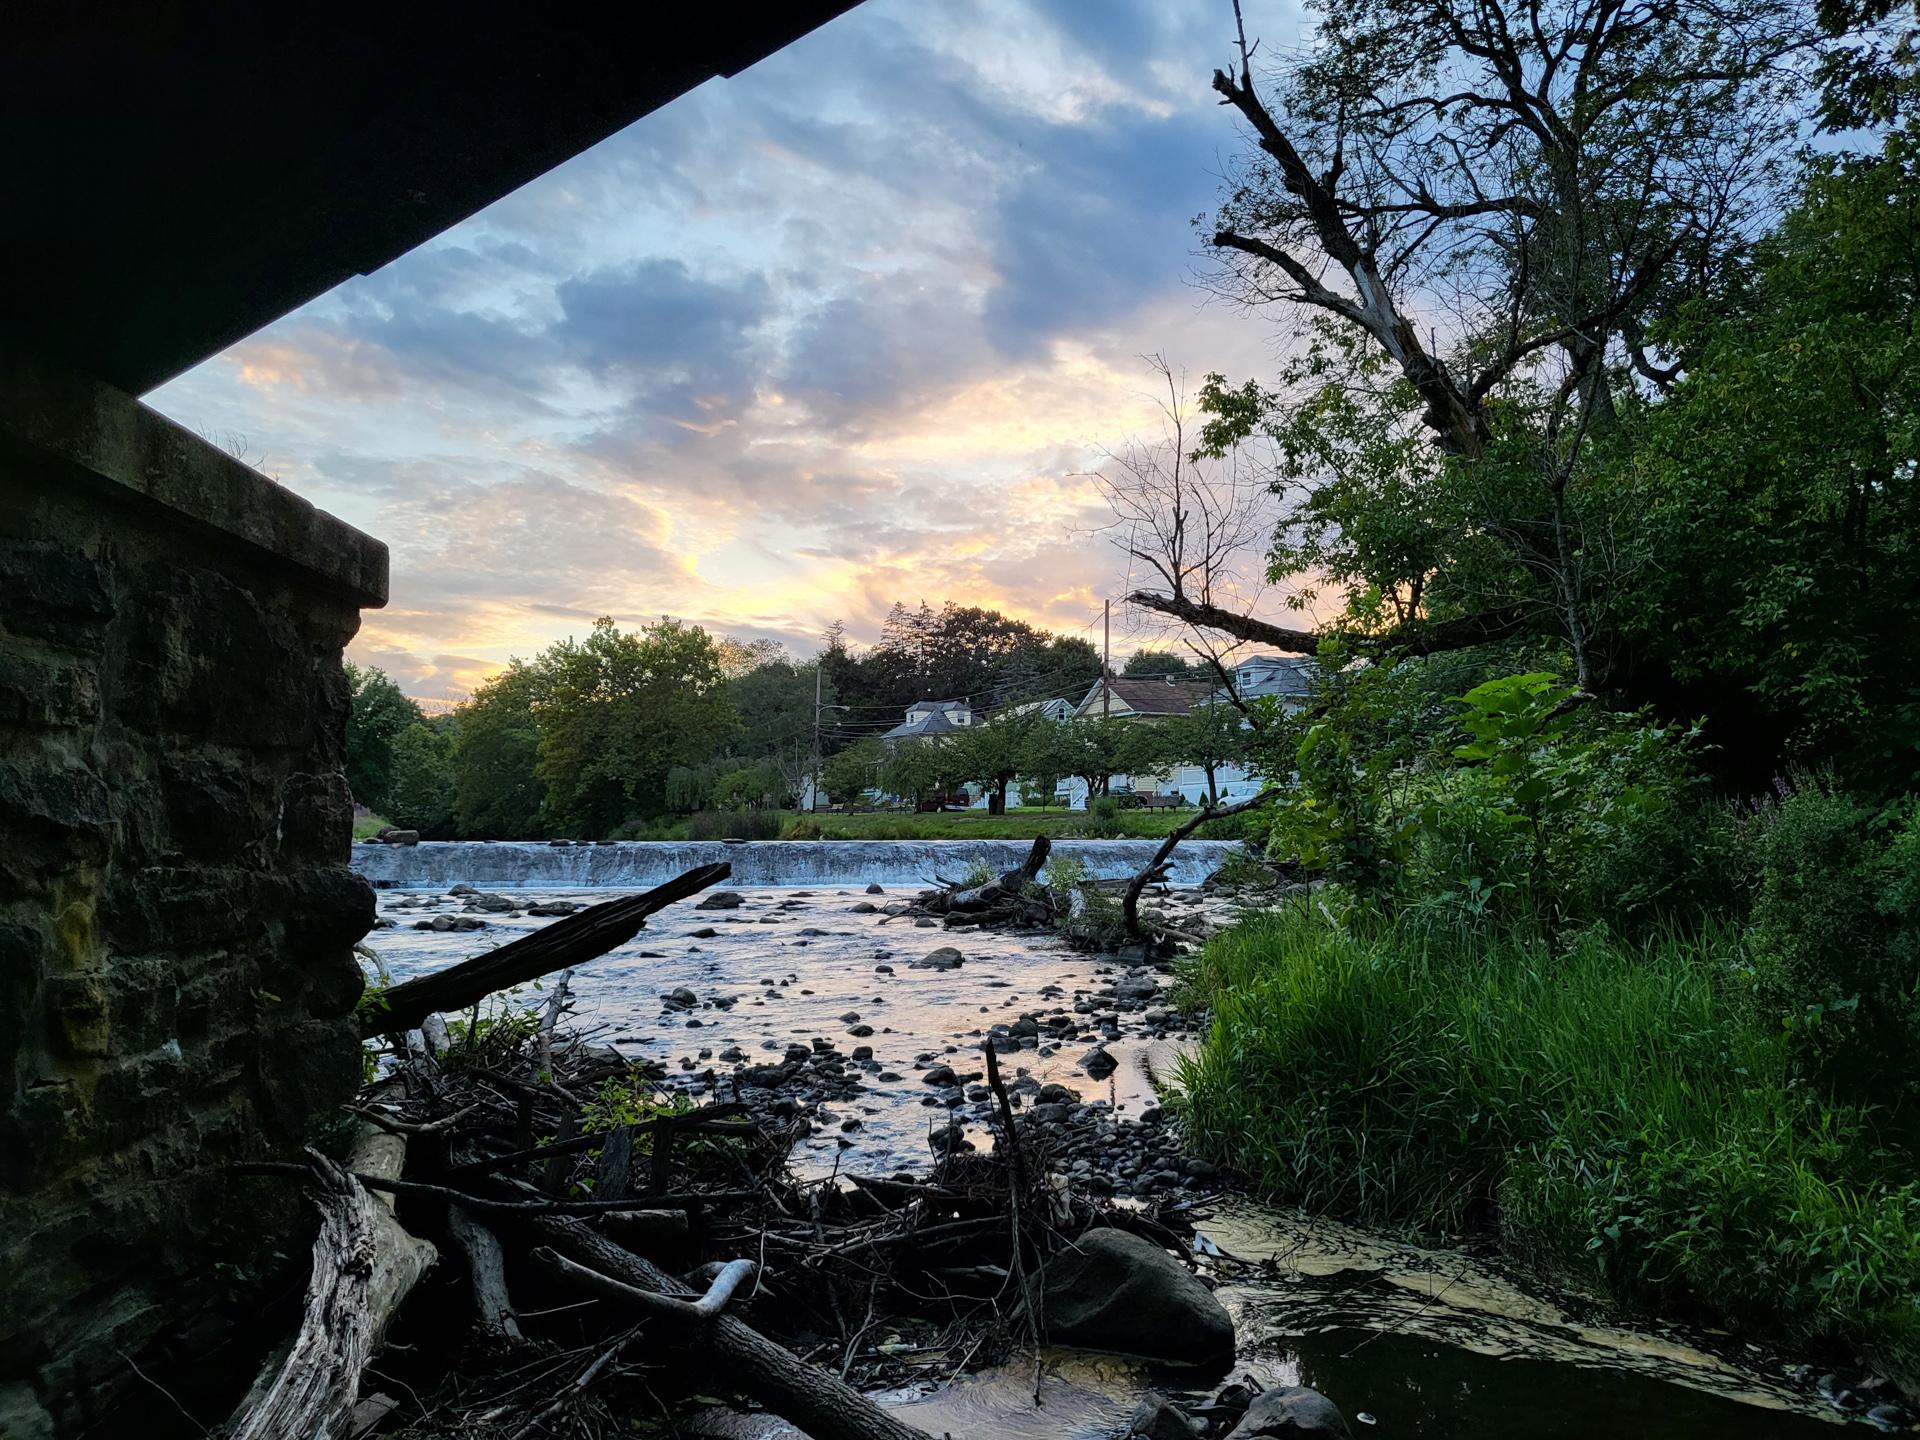 Samsung Galaxy Z Flip 3 photo sample bridge at dusk 1x